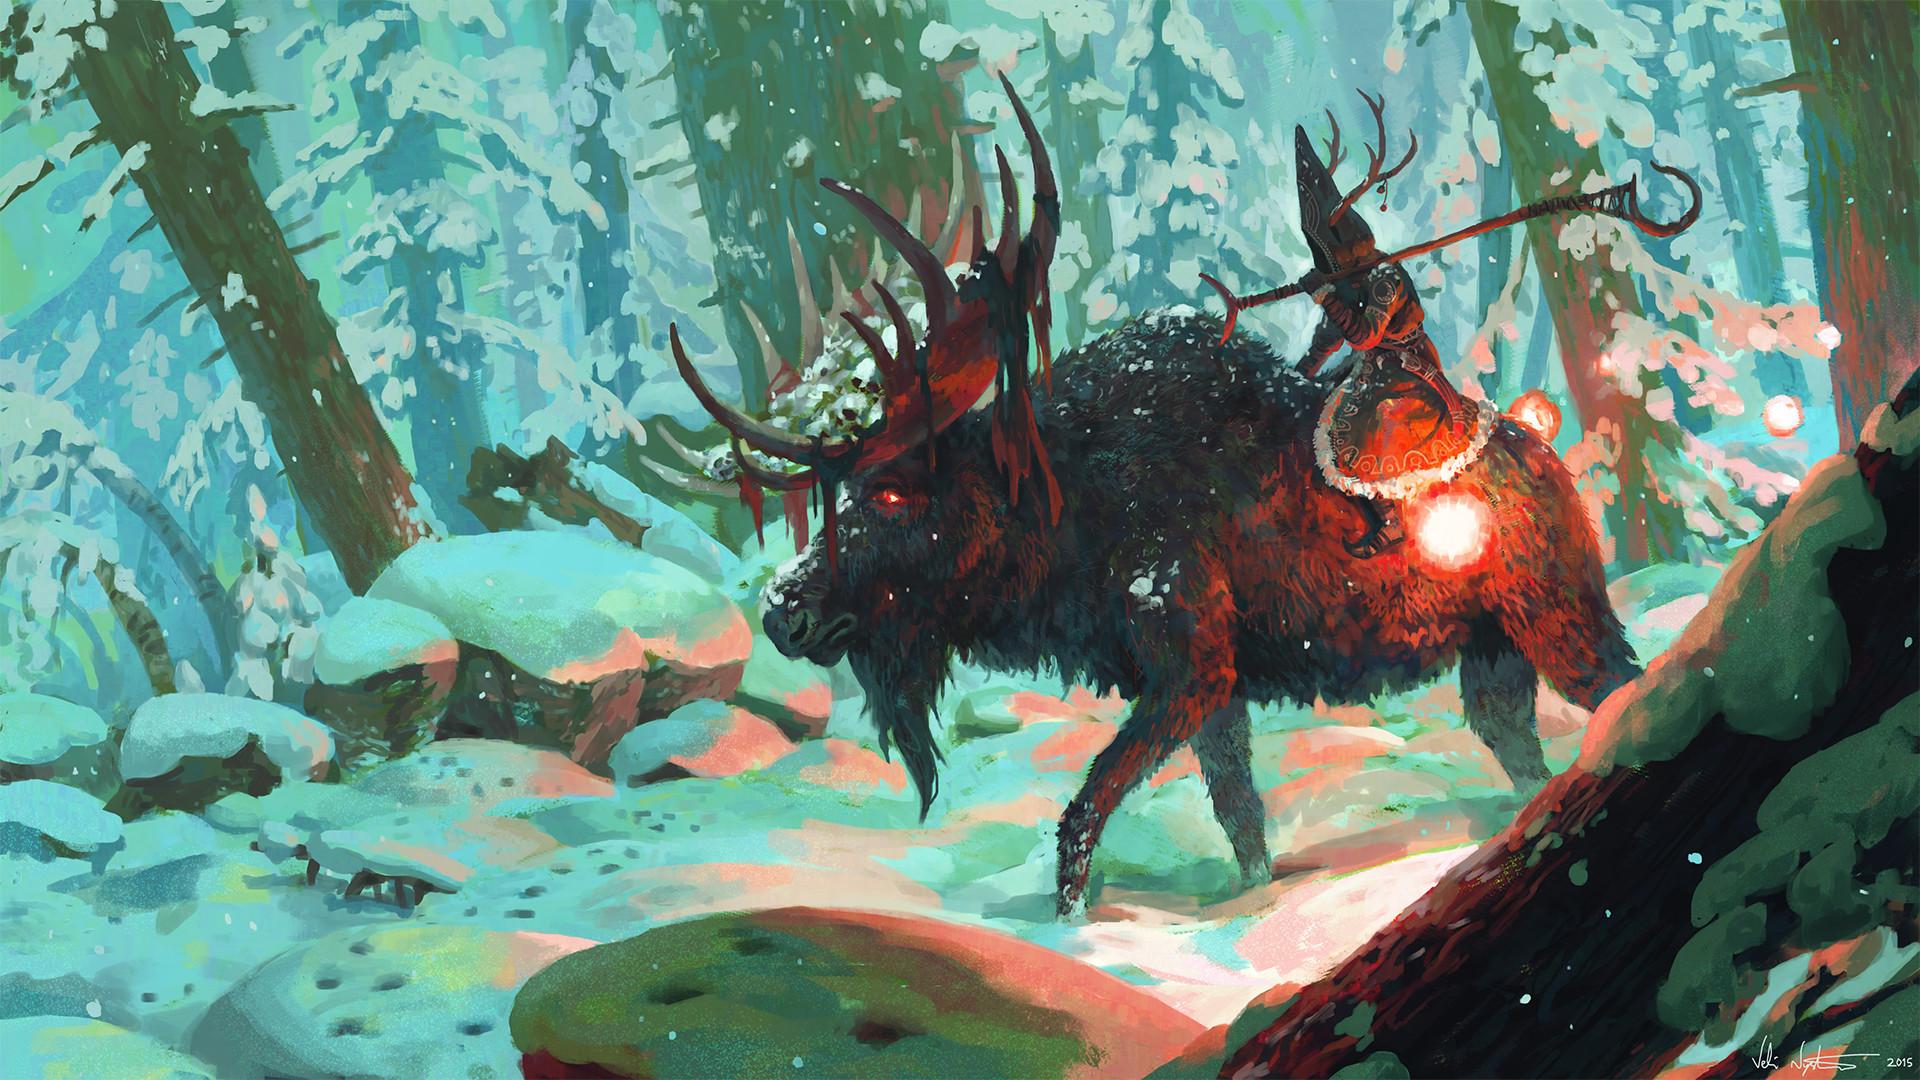 Veli nystrom finconauts joulukalenteri2015 velinystrom